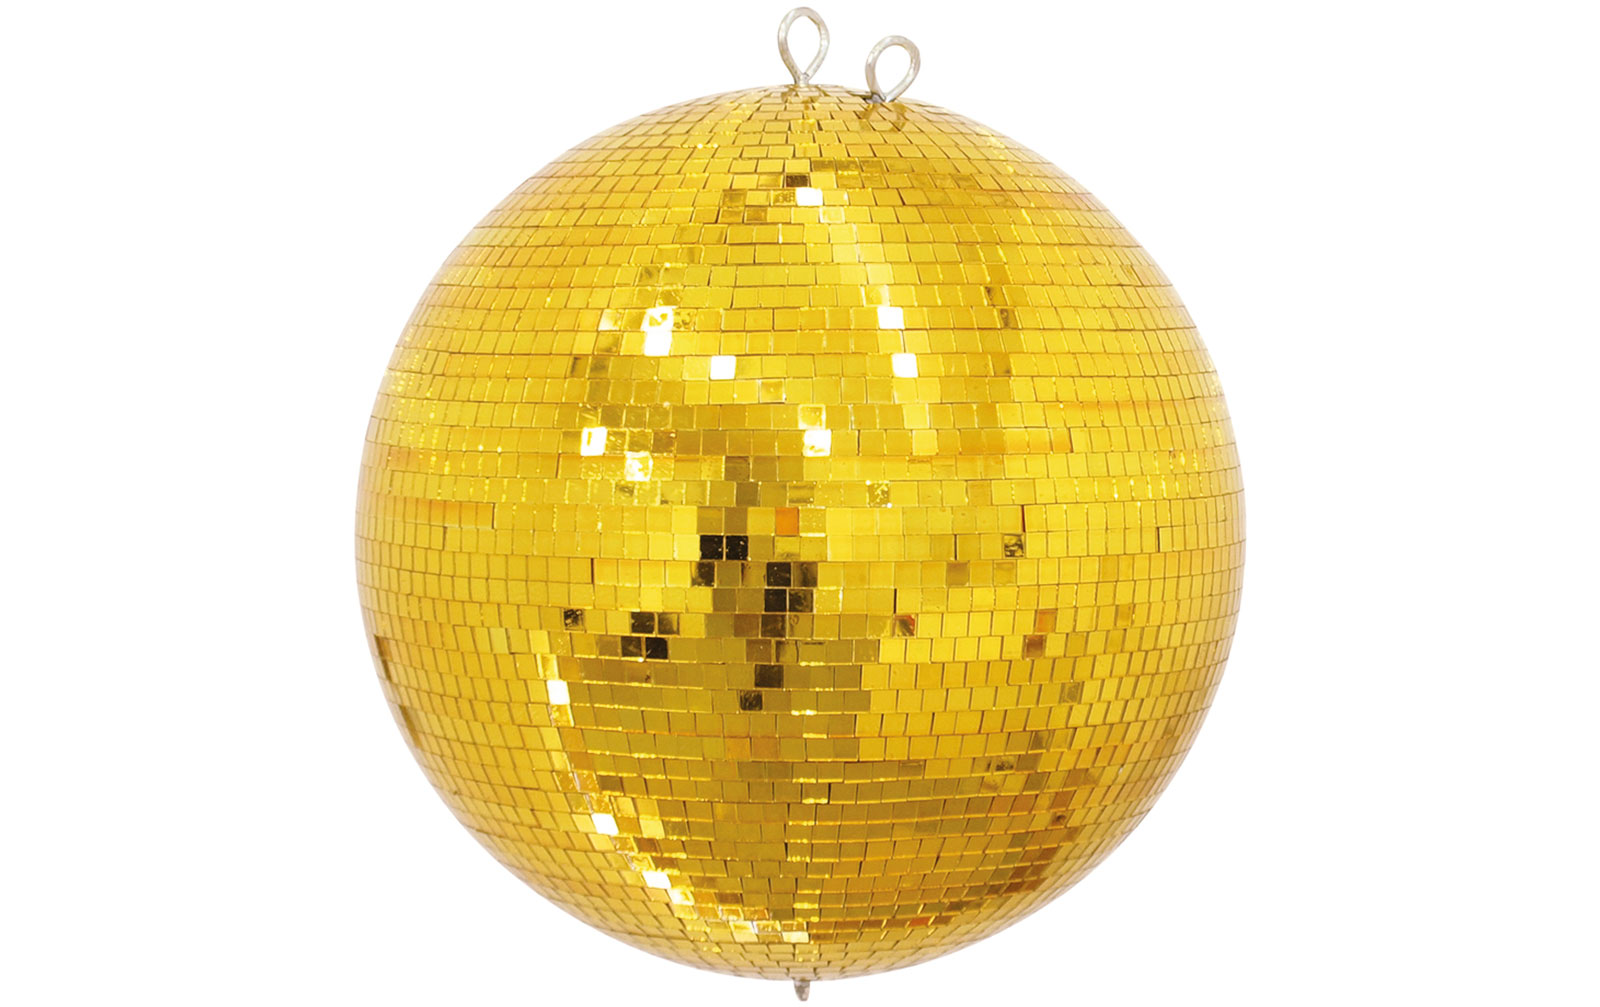 eurolite-spiegelkugel-50cm-gold